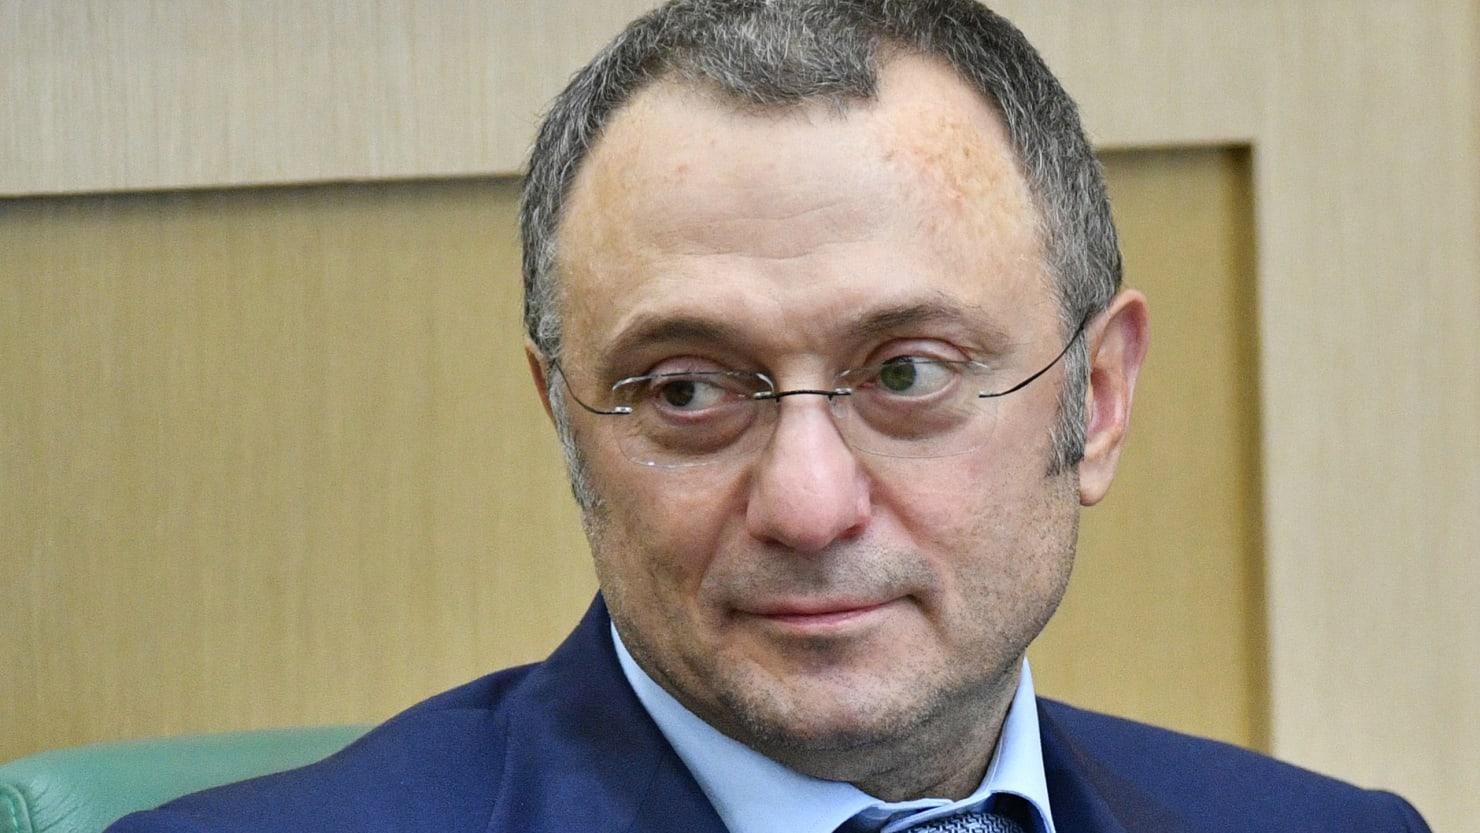 Suleiman Kerimov arrested in France